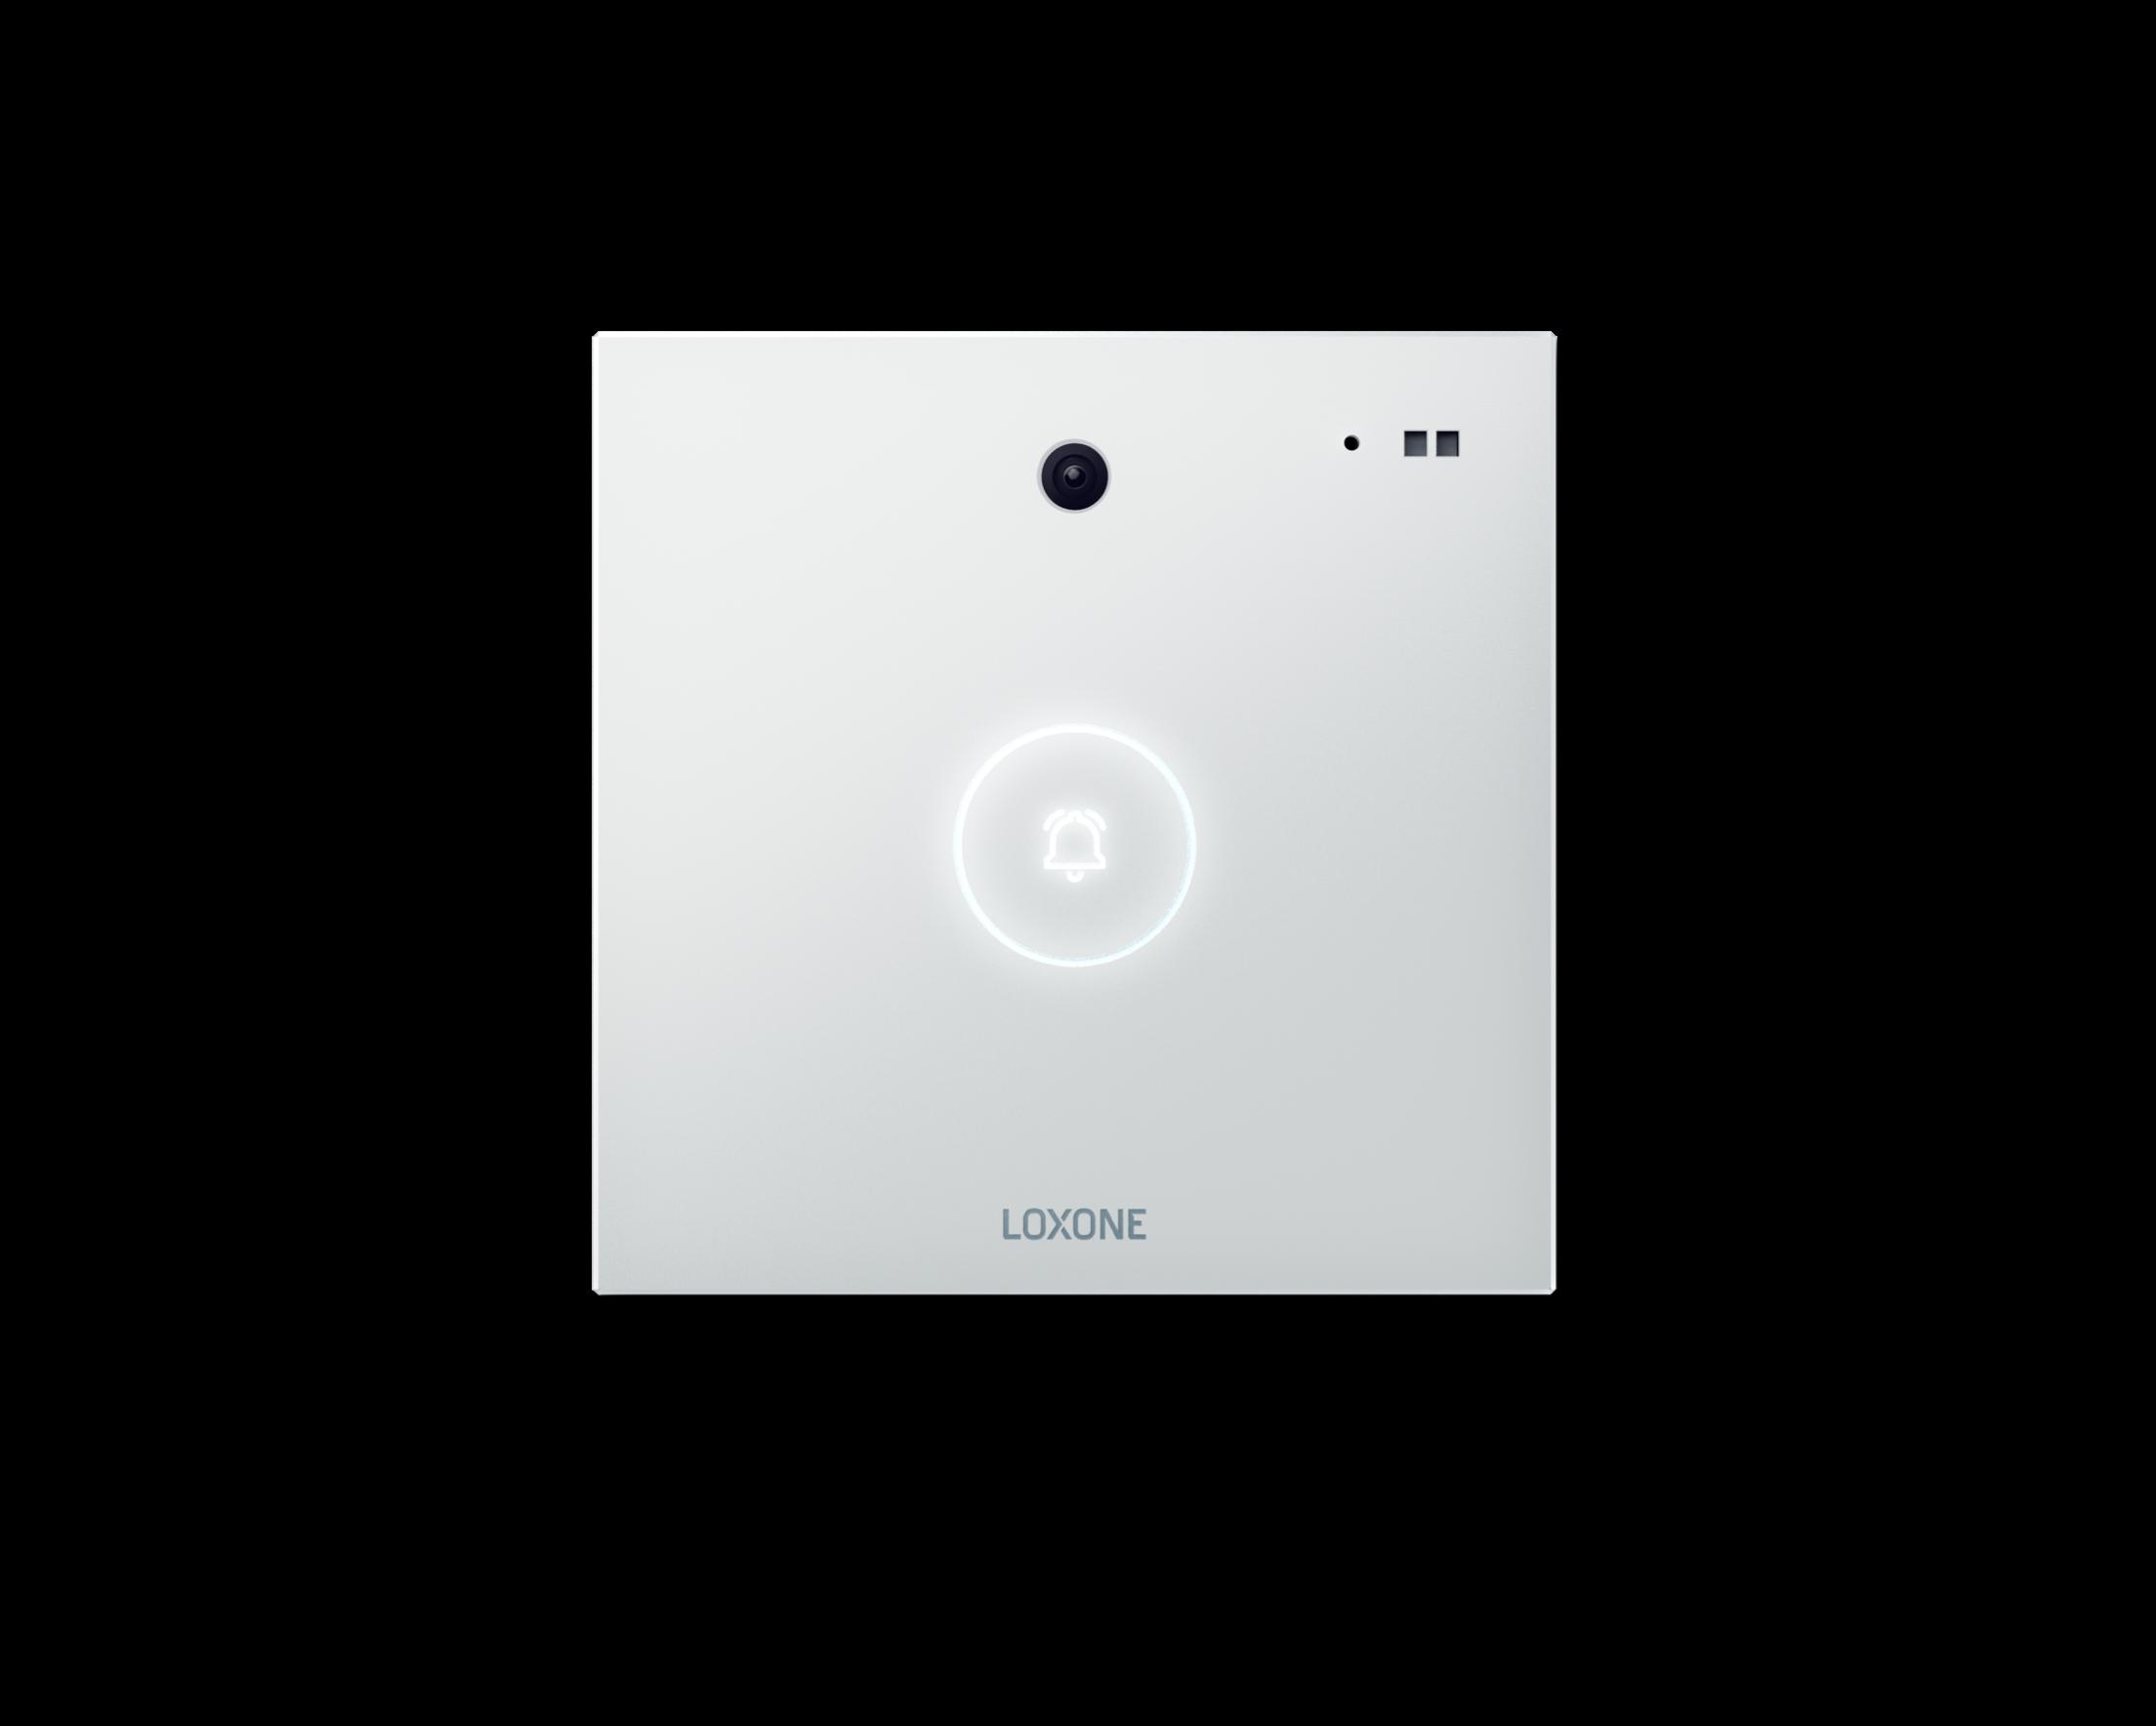 Loxone Intercom